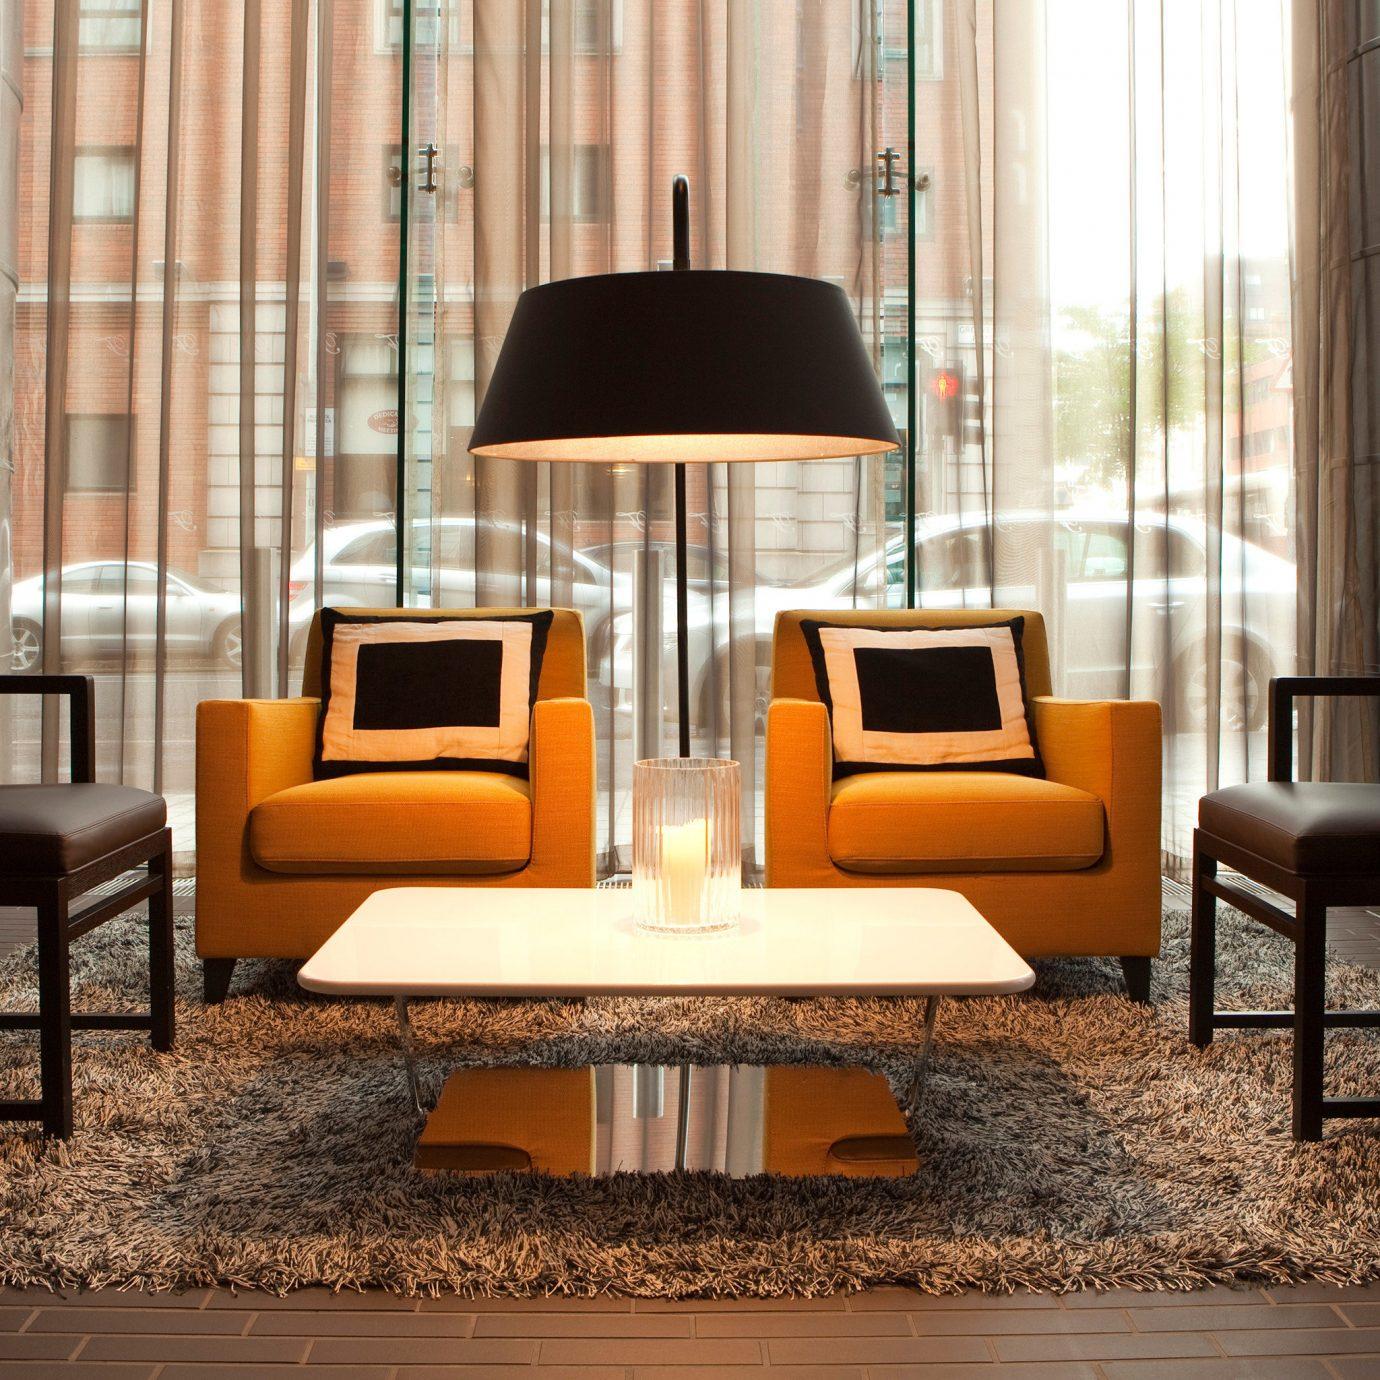 Hip Lounge Luxury Modern chair living room home house hardwood flooring Lobby lighting wood flooring